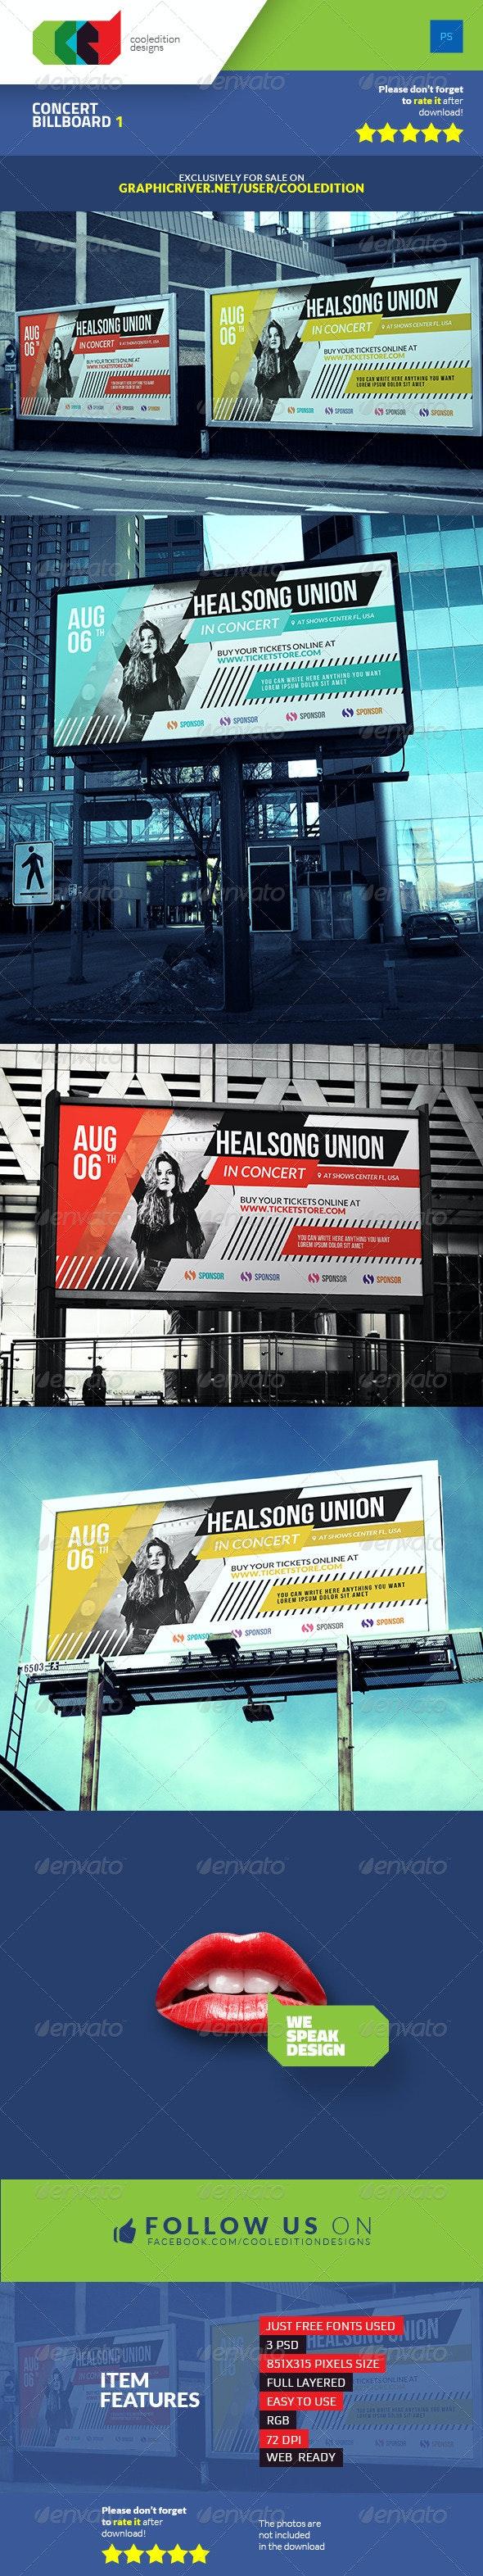 Concert Billboard 1 - Signage Print Templates